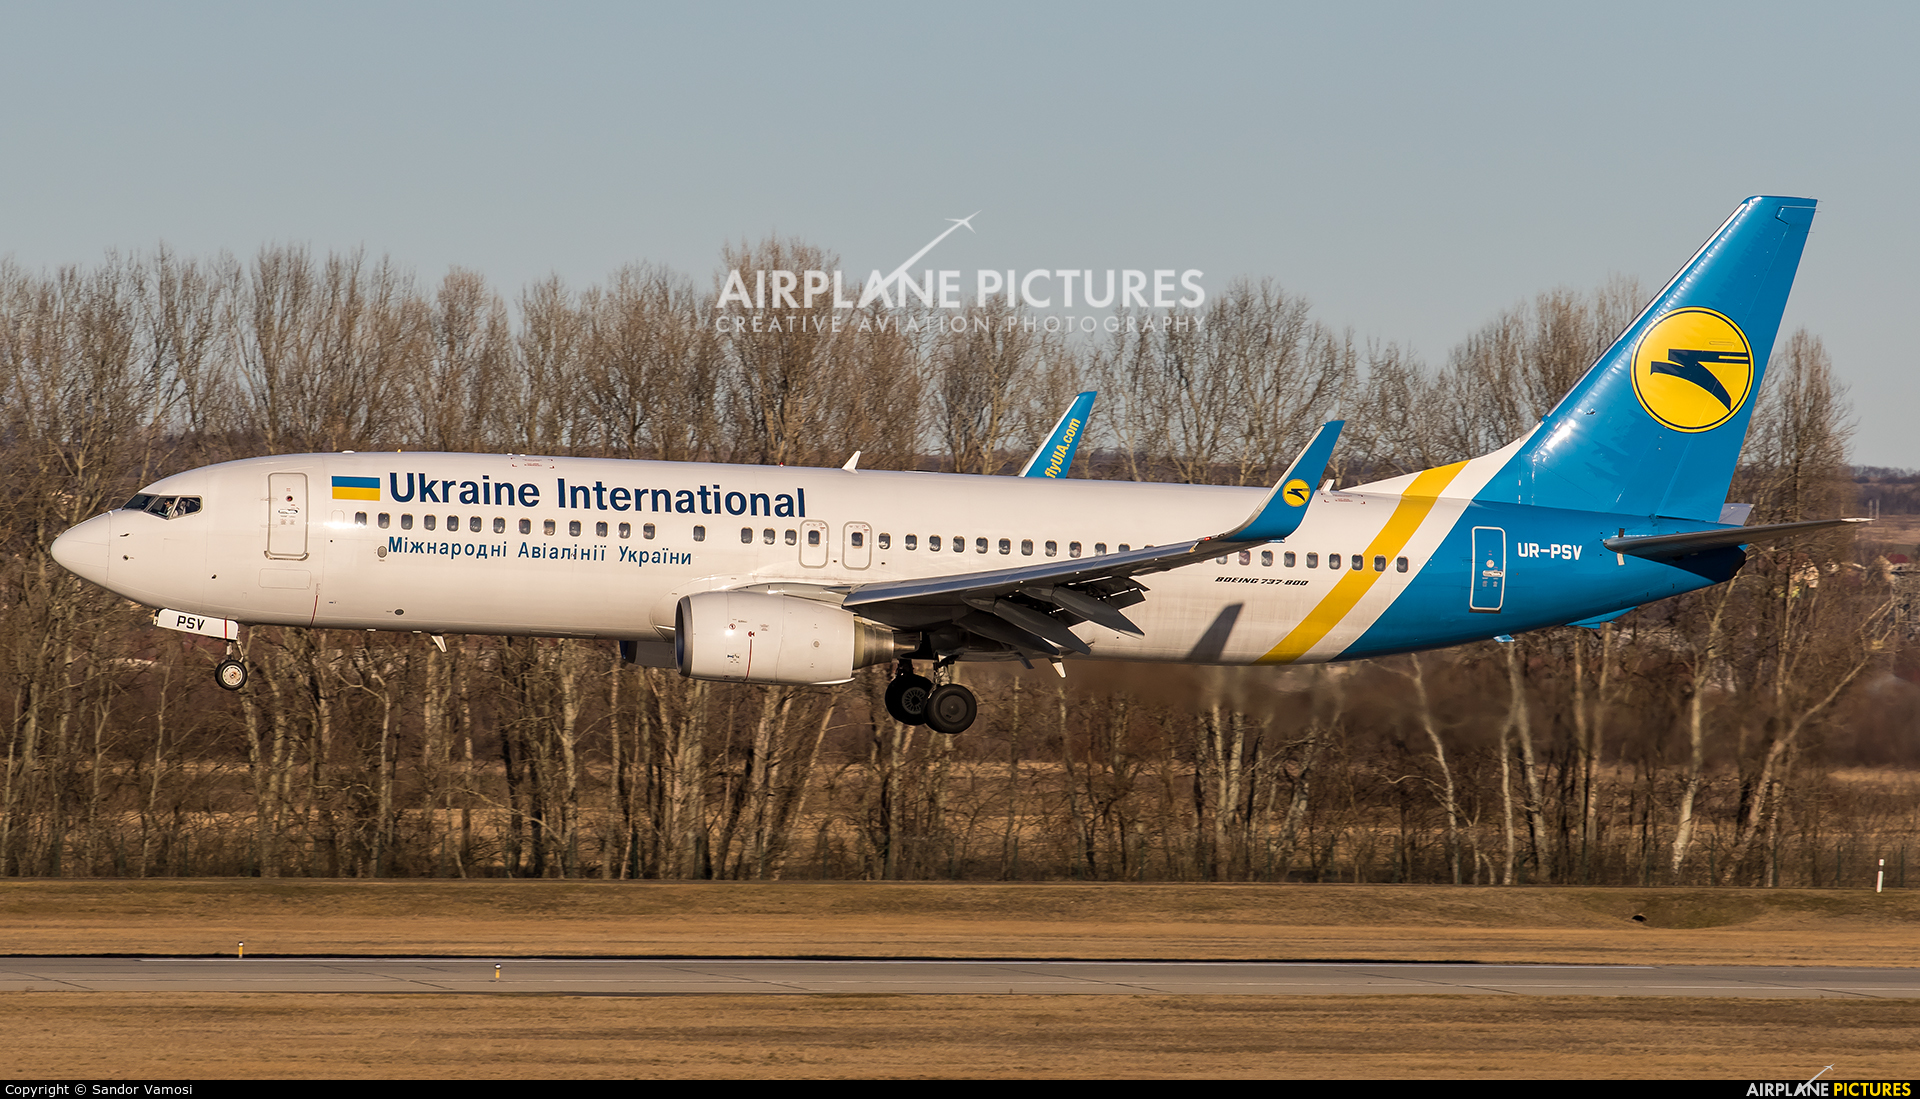 Ukraine International Airlines UR-PSV aircraft at Budapest Ferenc Liszt International Airport